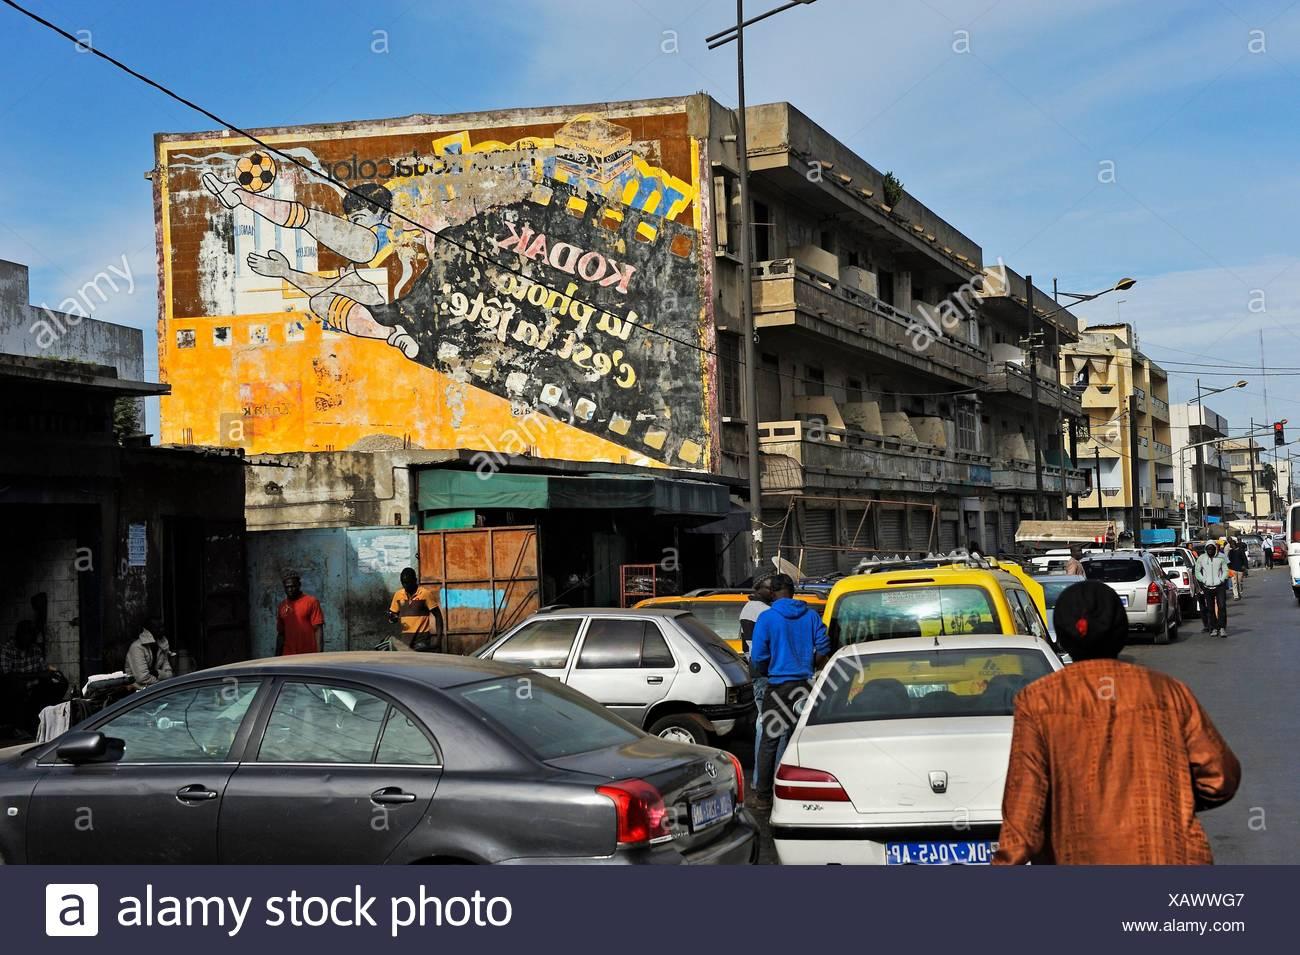 Dakar, Senegal Africa Occidentale. Immagini Stock